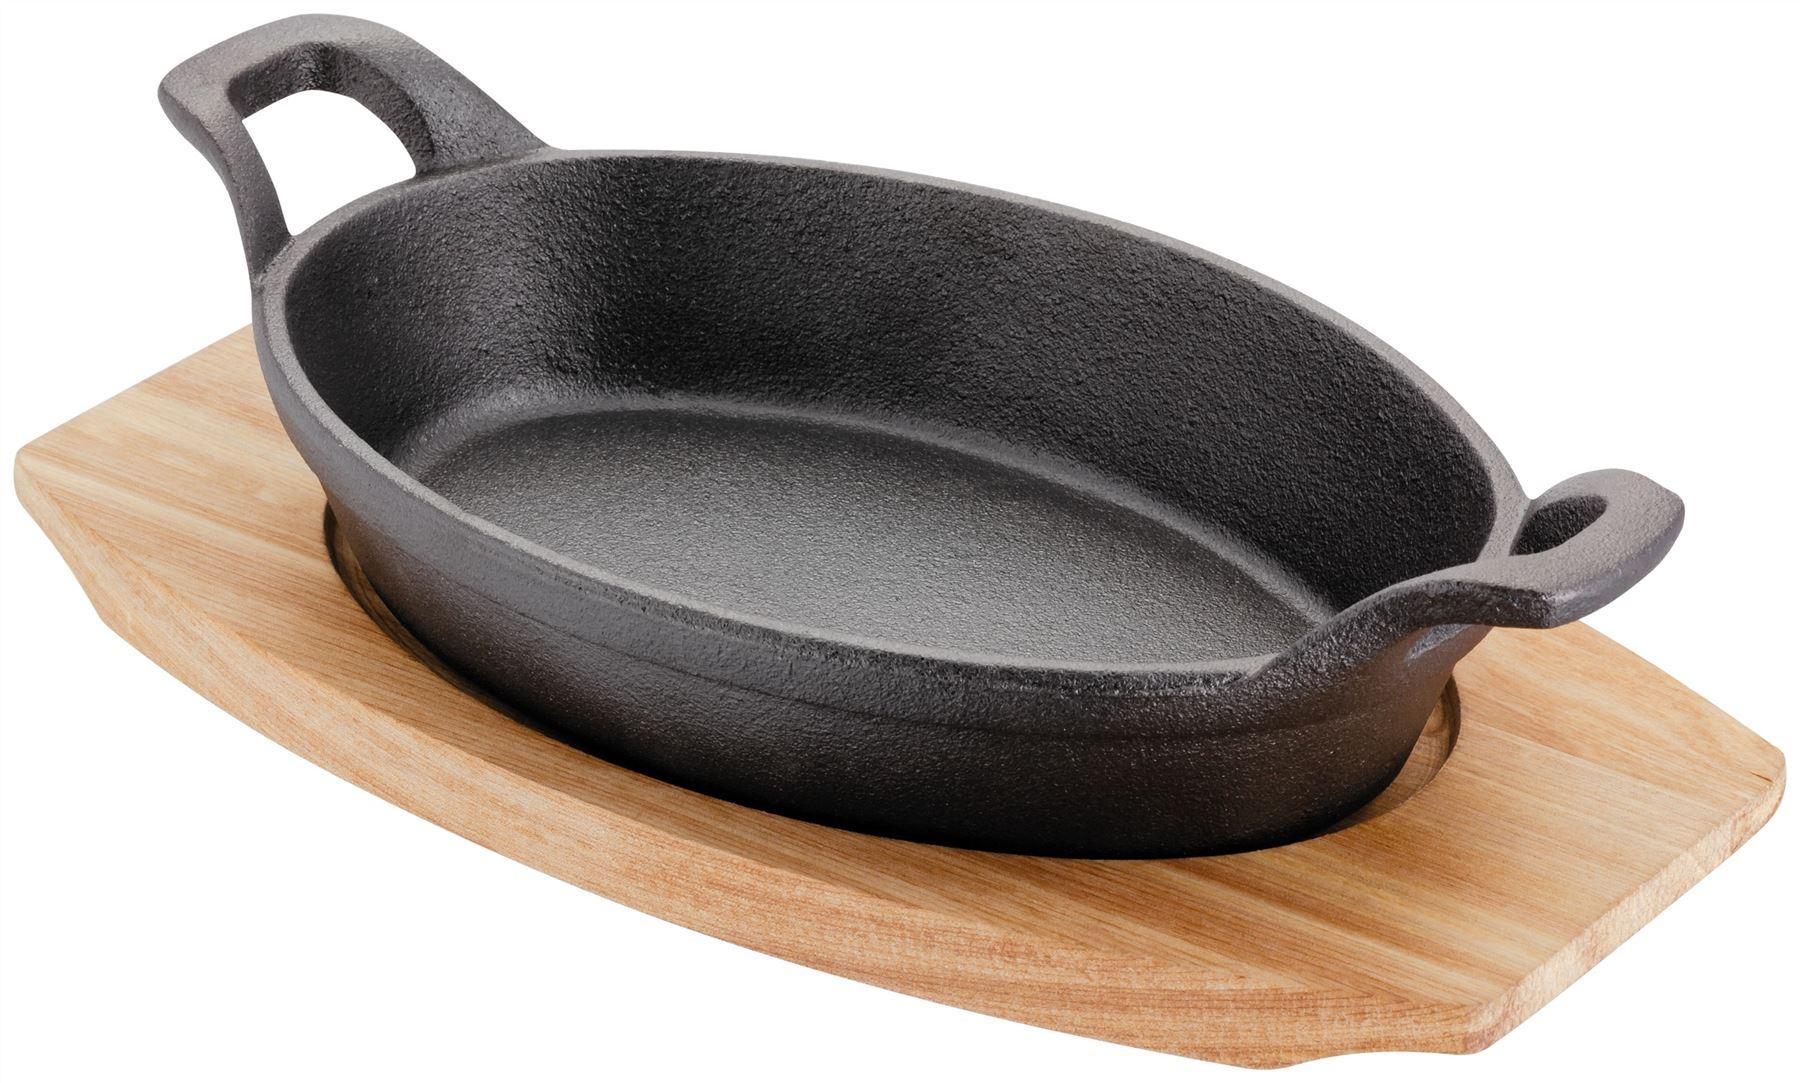 Judge Sizzle Amp Serve Cast Iron Gratin Griddle Dish With